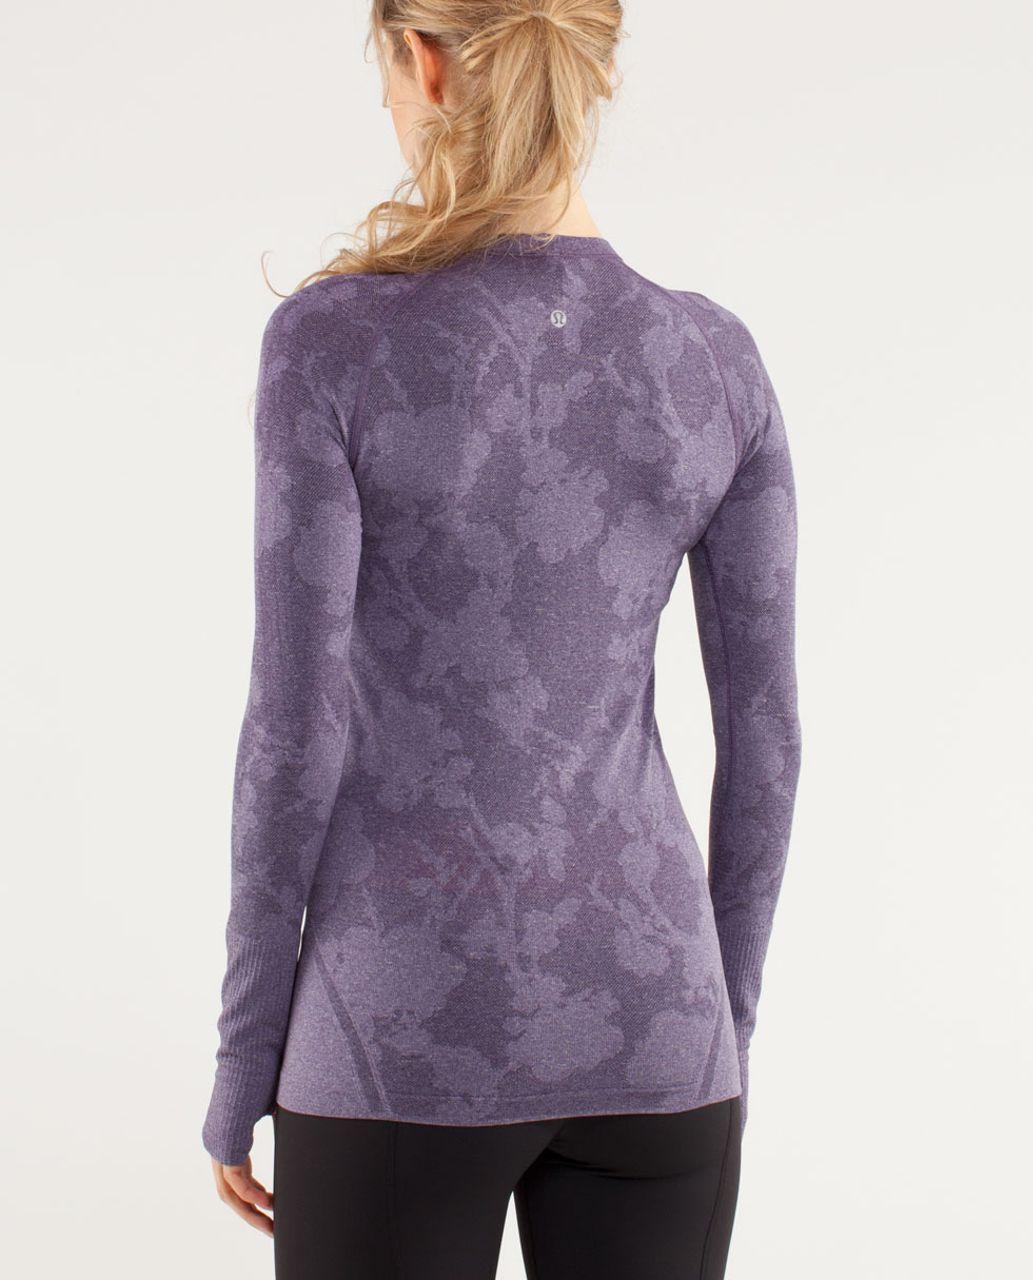 Lululemon Run:  Swiftly Tech Long Sleeve *Special Edition - Concord Grape